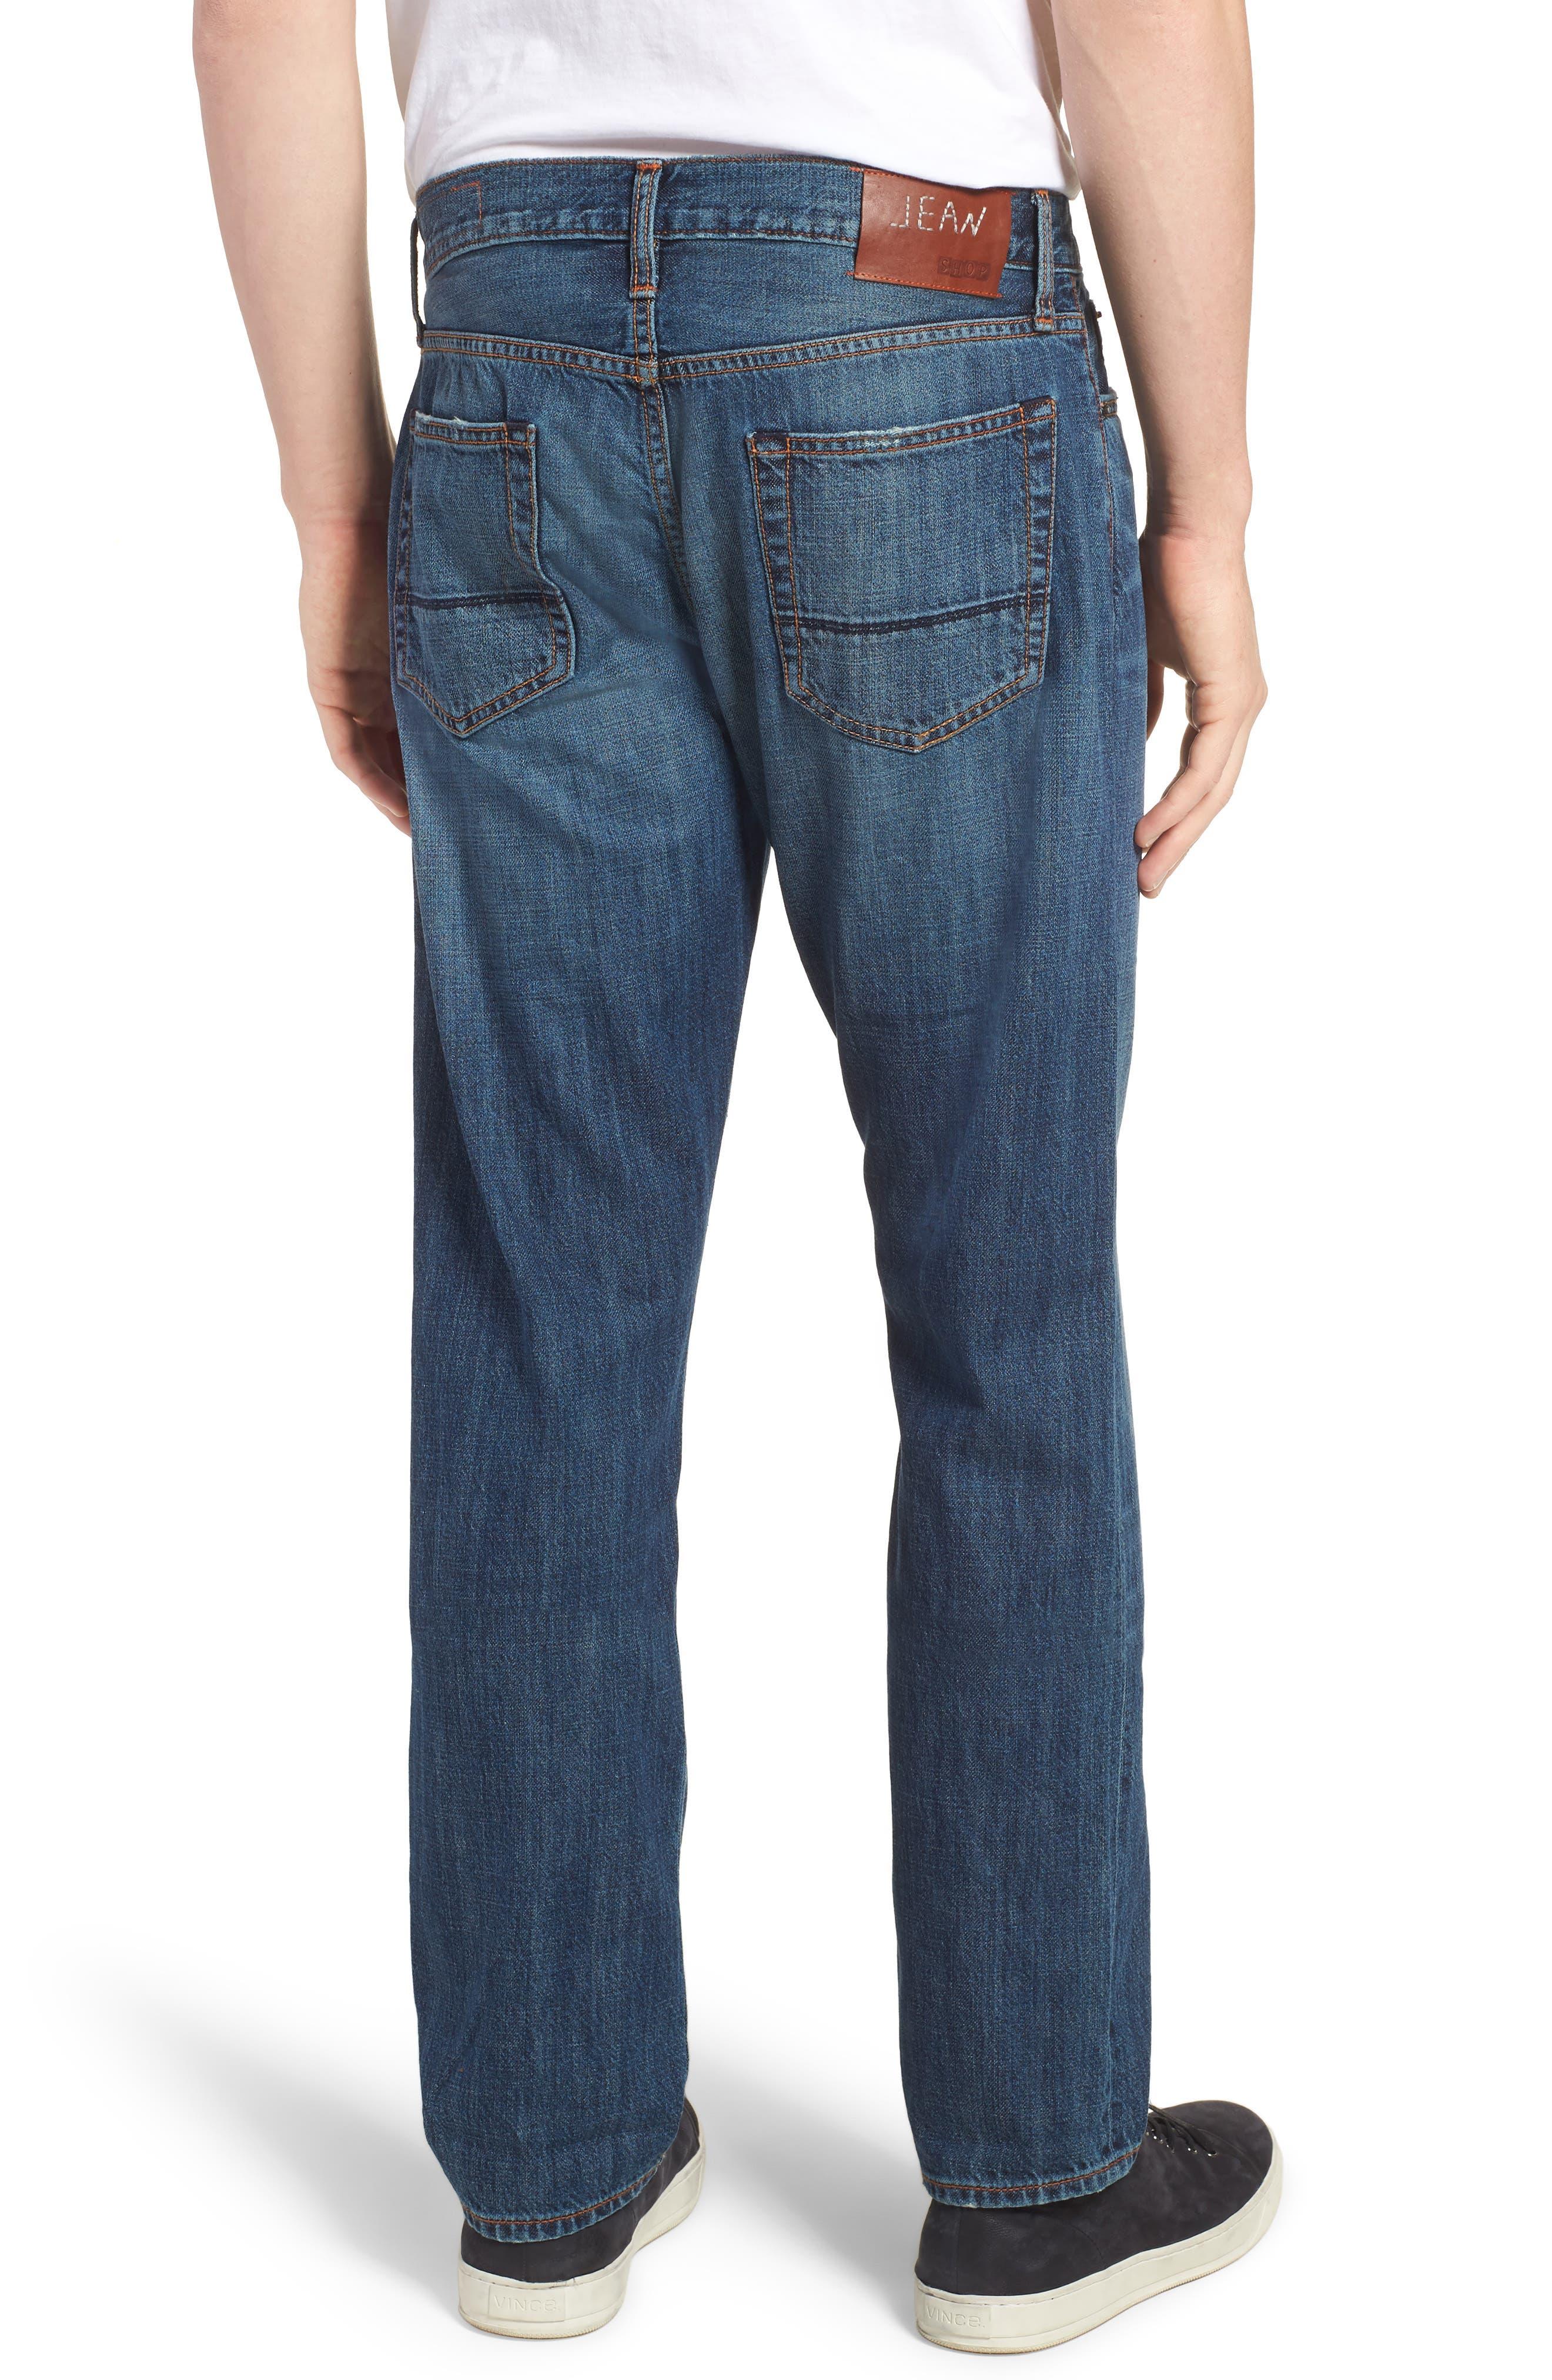 Jim Slim Fit Jeans,                             Alternate thumbnail 2, color,                             Greenwood